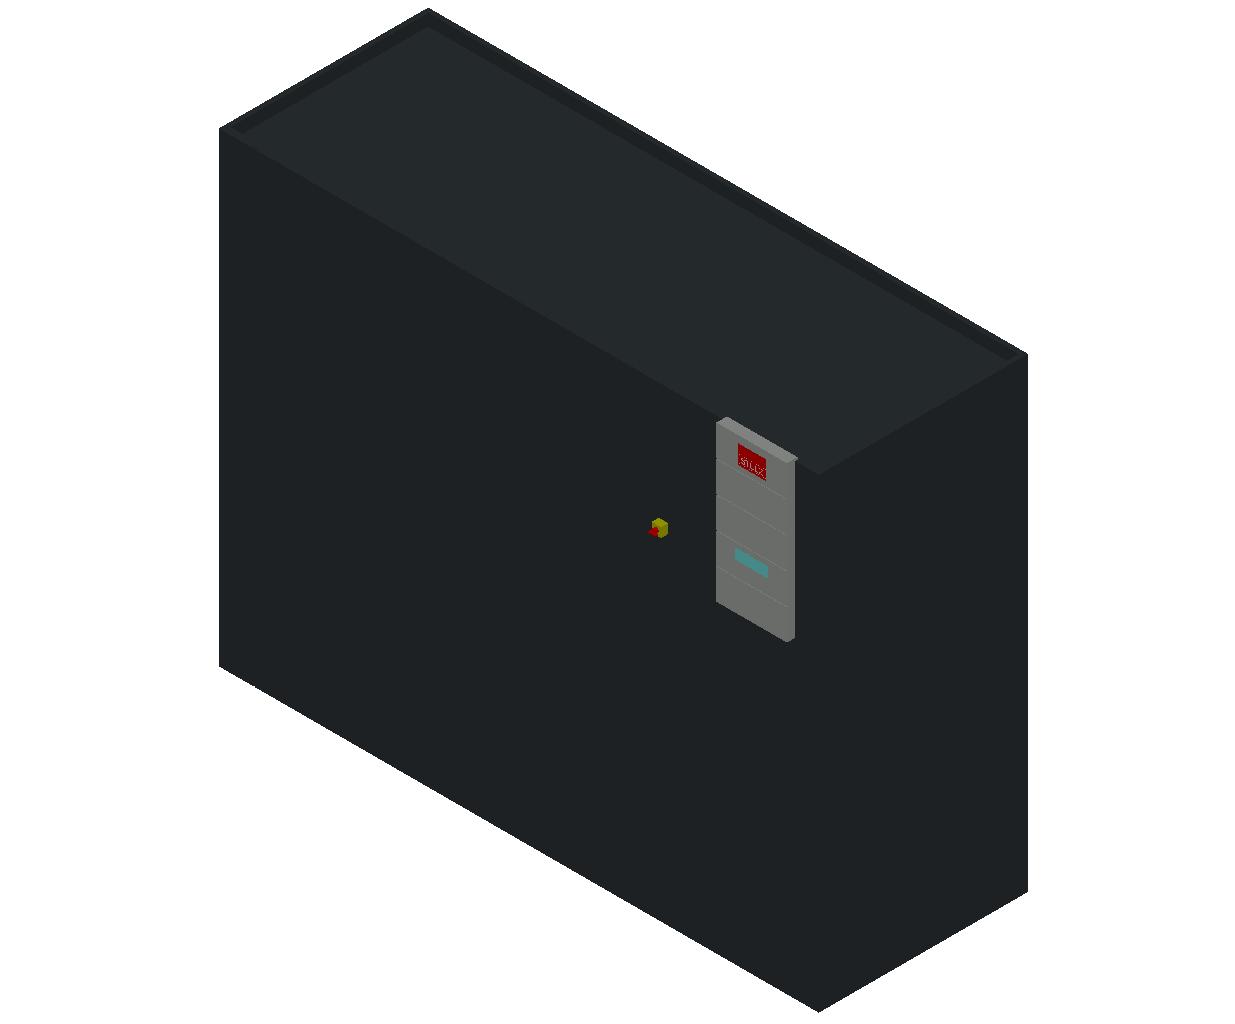 HC_Air Conditioner_Indoor Unit_MEPcontent_STULZ_CyberAir 3PRO_ASD_Dual Circuit A_ASD_902_A_INT-EN.dwg